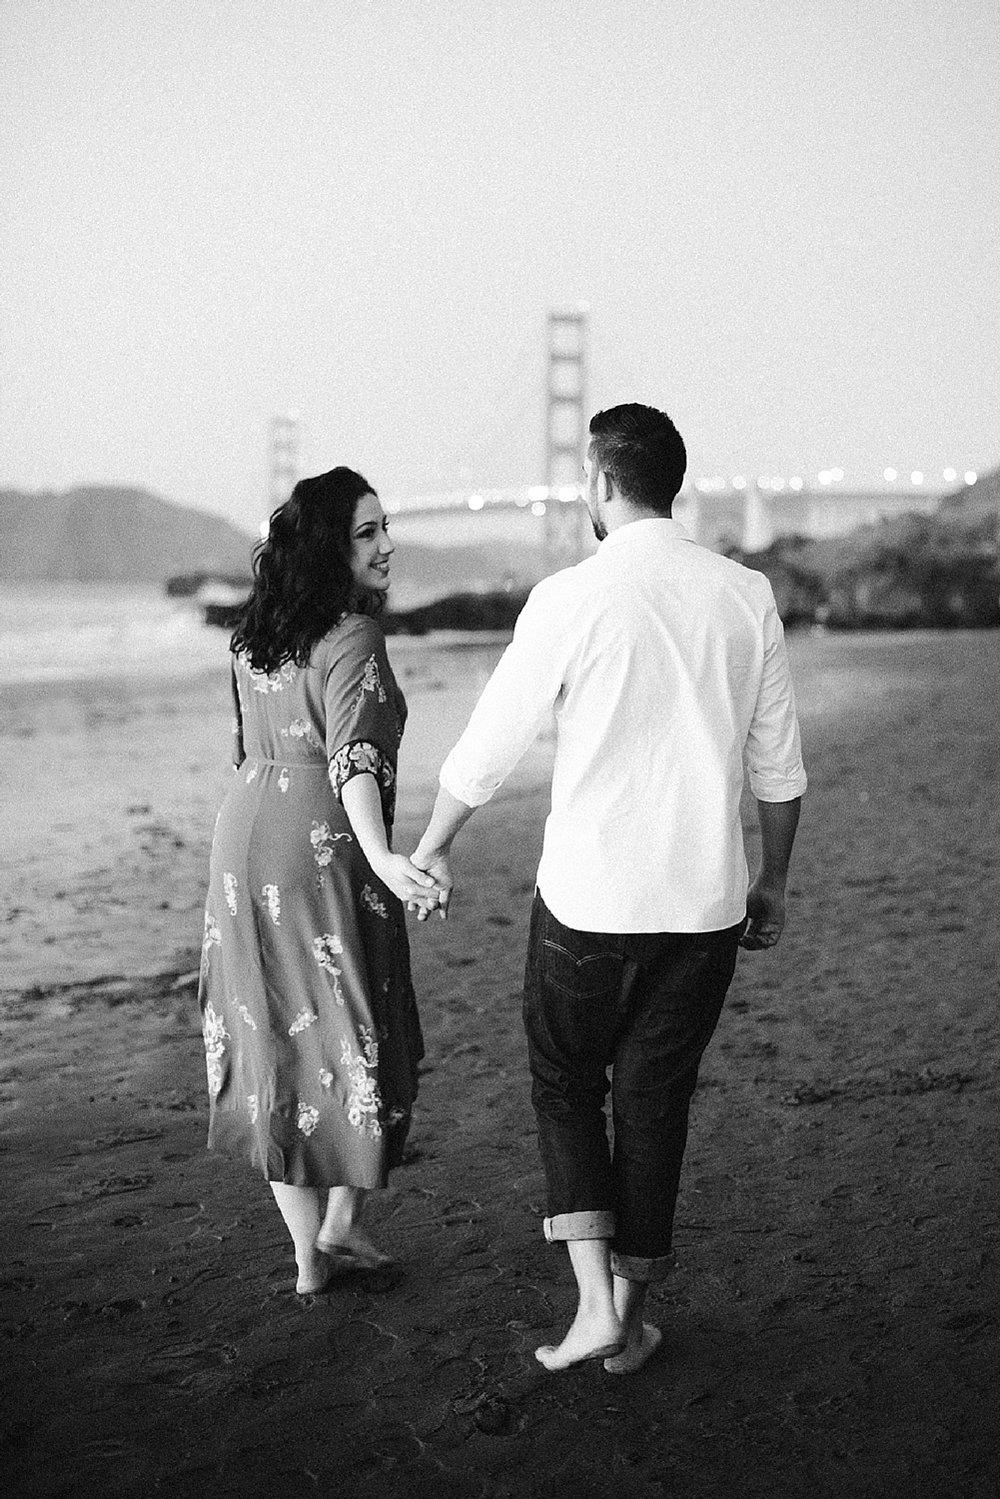 Golden-Gate-Bridge-San-Francisco.jpg